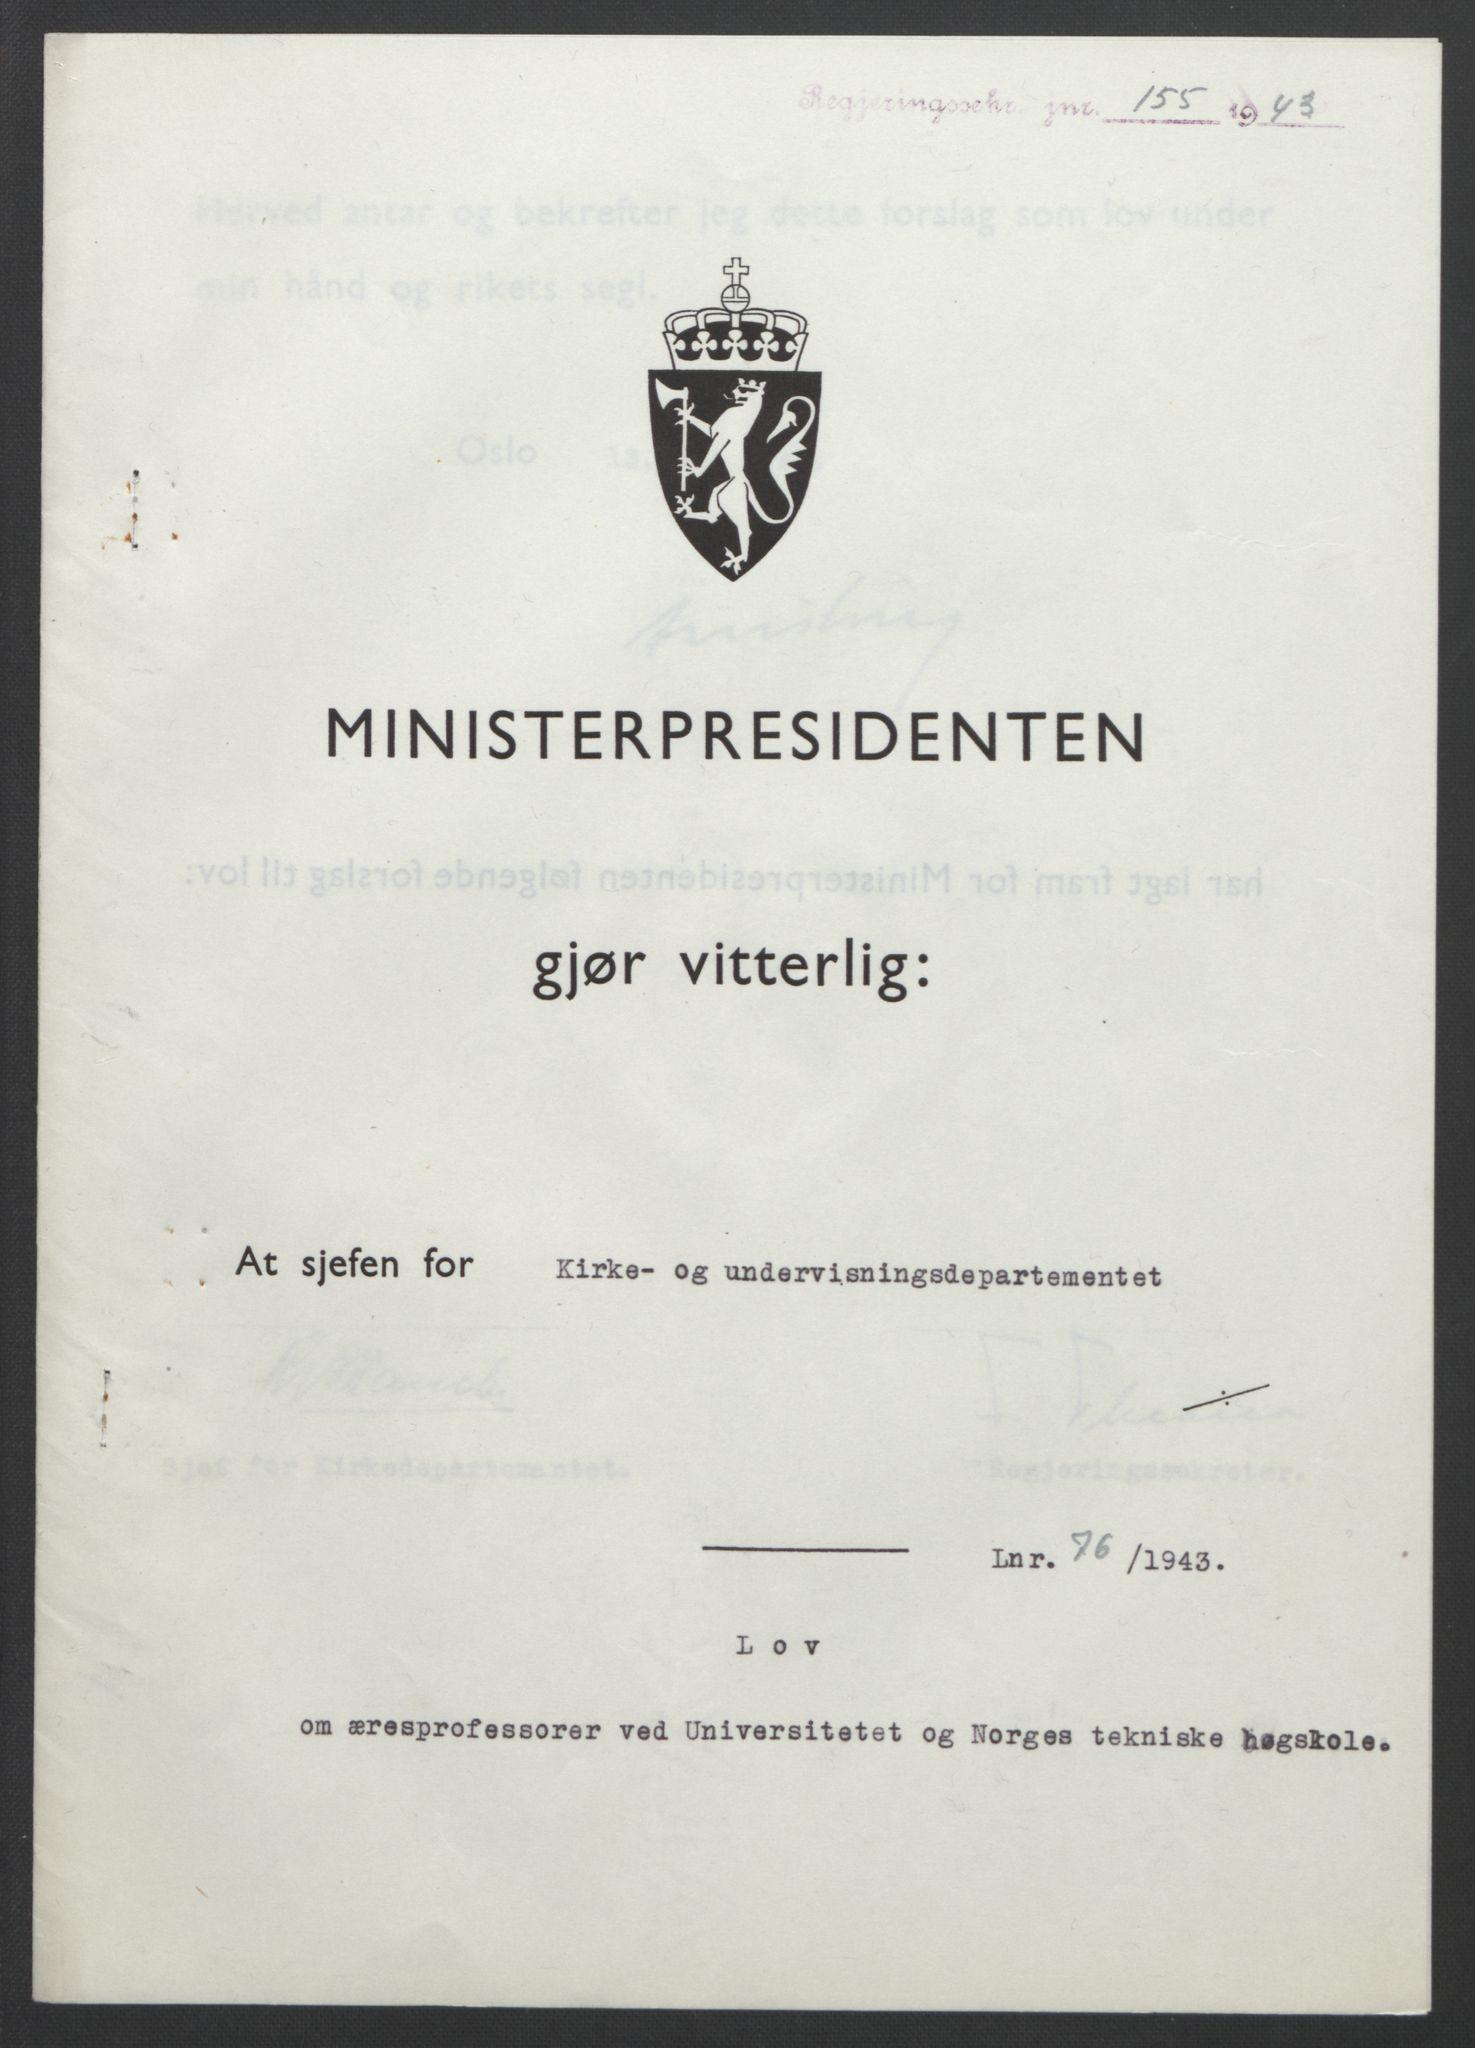 RA, NS-administrasjonen 1940-1945 (Statsrådsekretariatet, de kommisariske statsråder mm), D/Db/L0099: Lover, 1943, s. 349